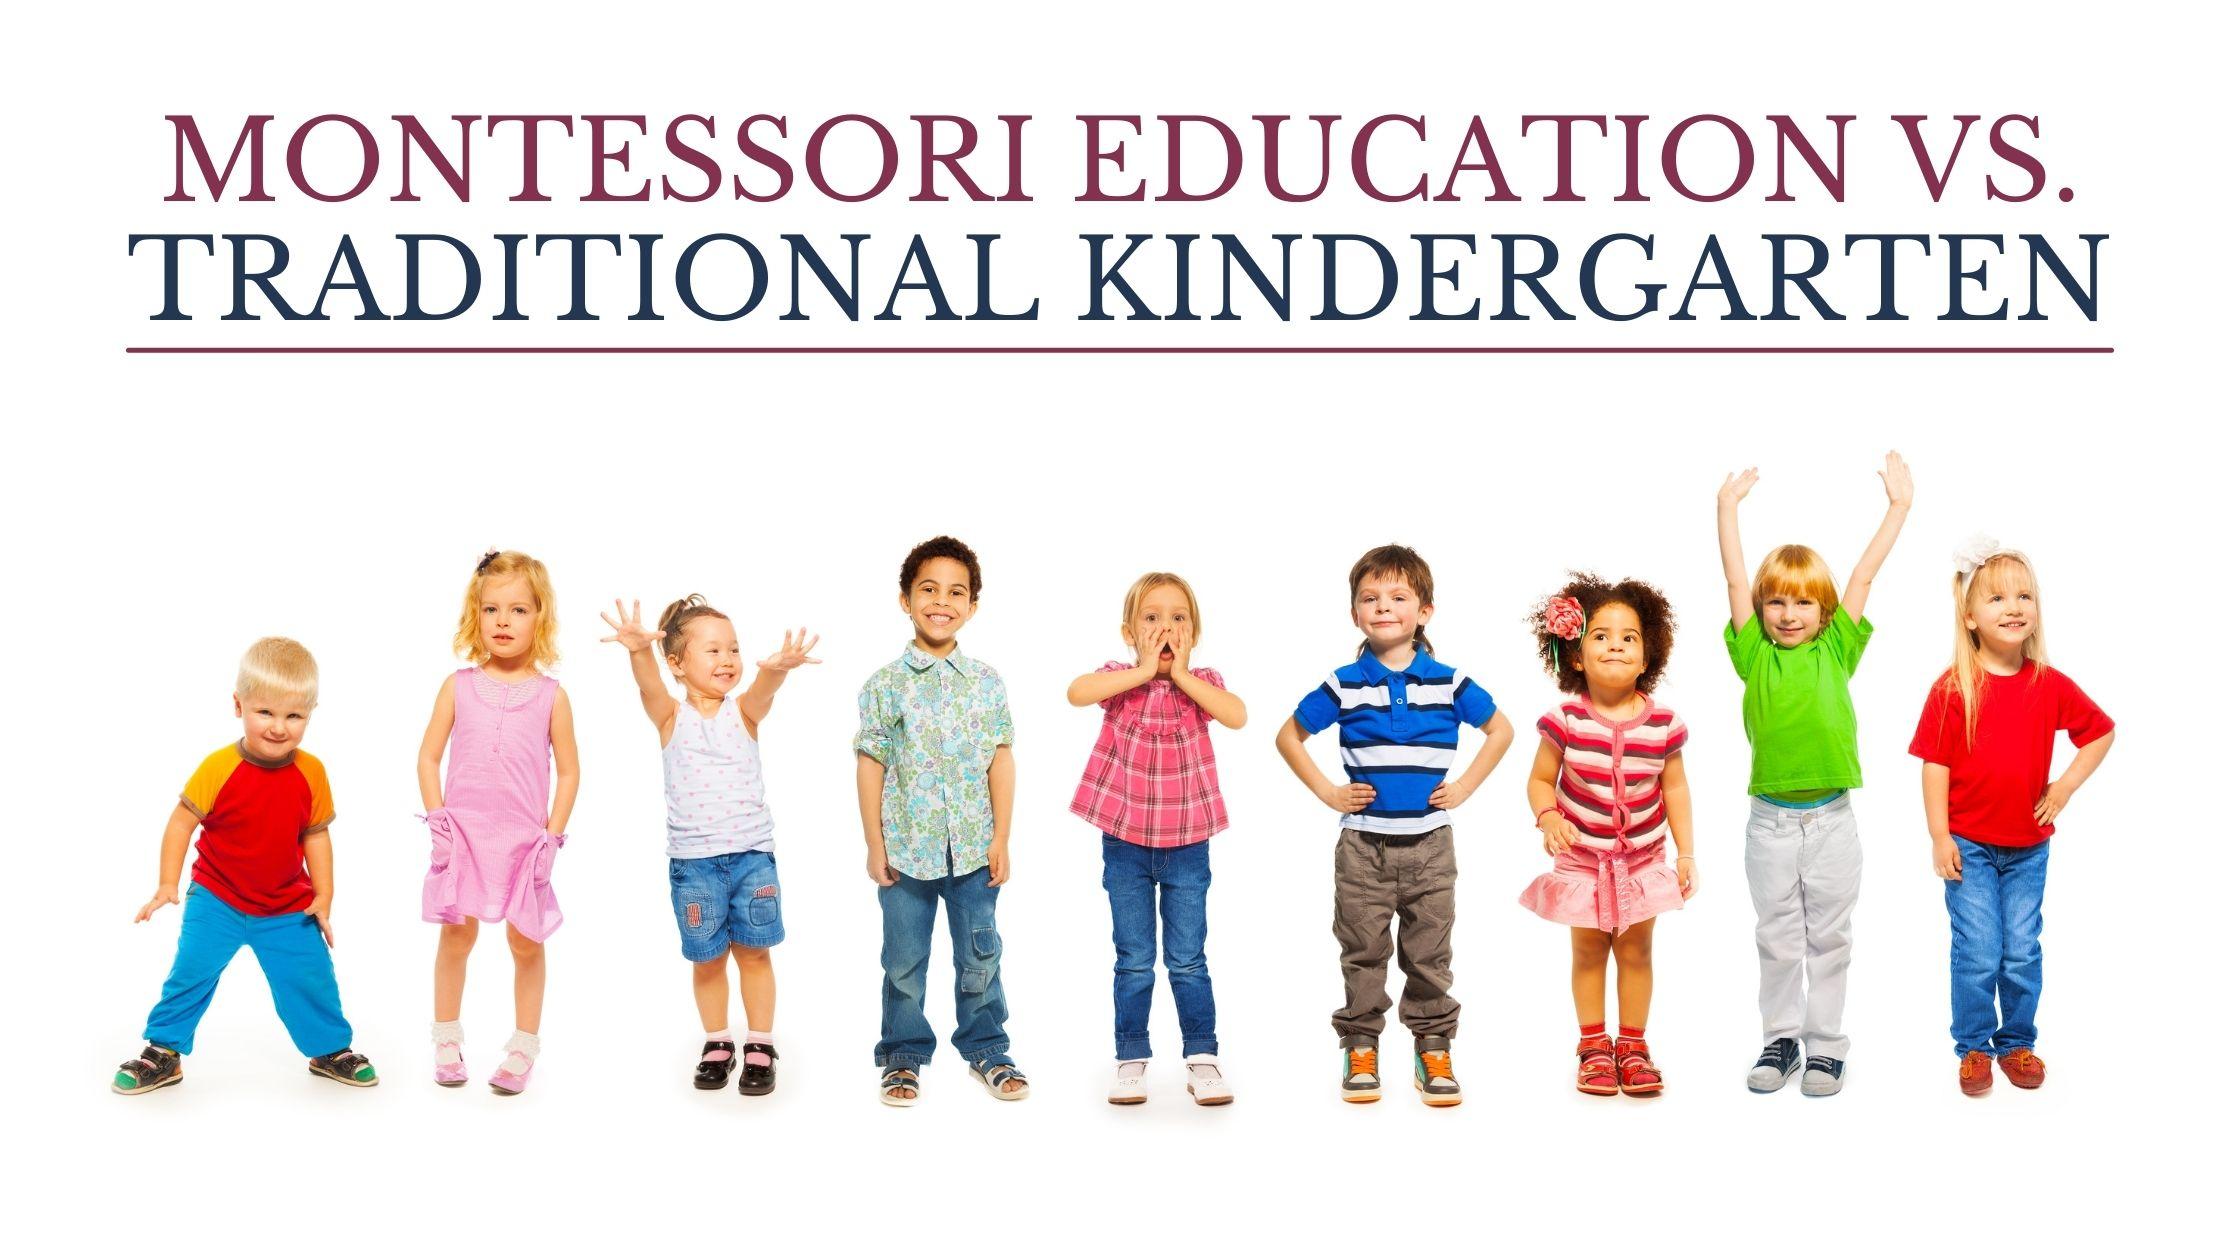 Montessori Education vs. Traditional Kindergarten Blog Post Cover